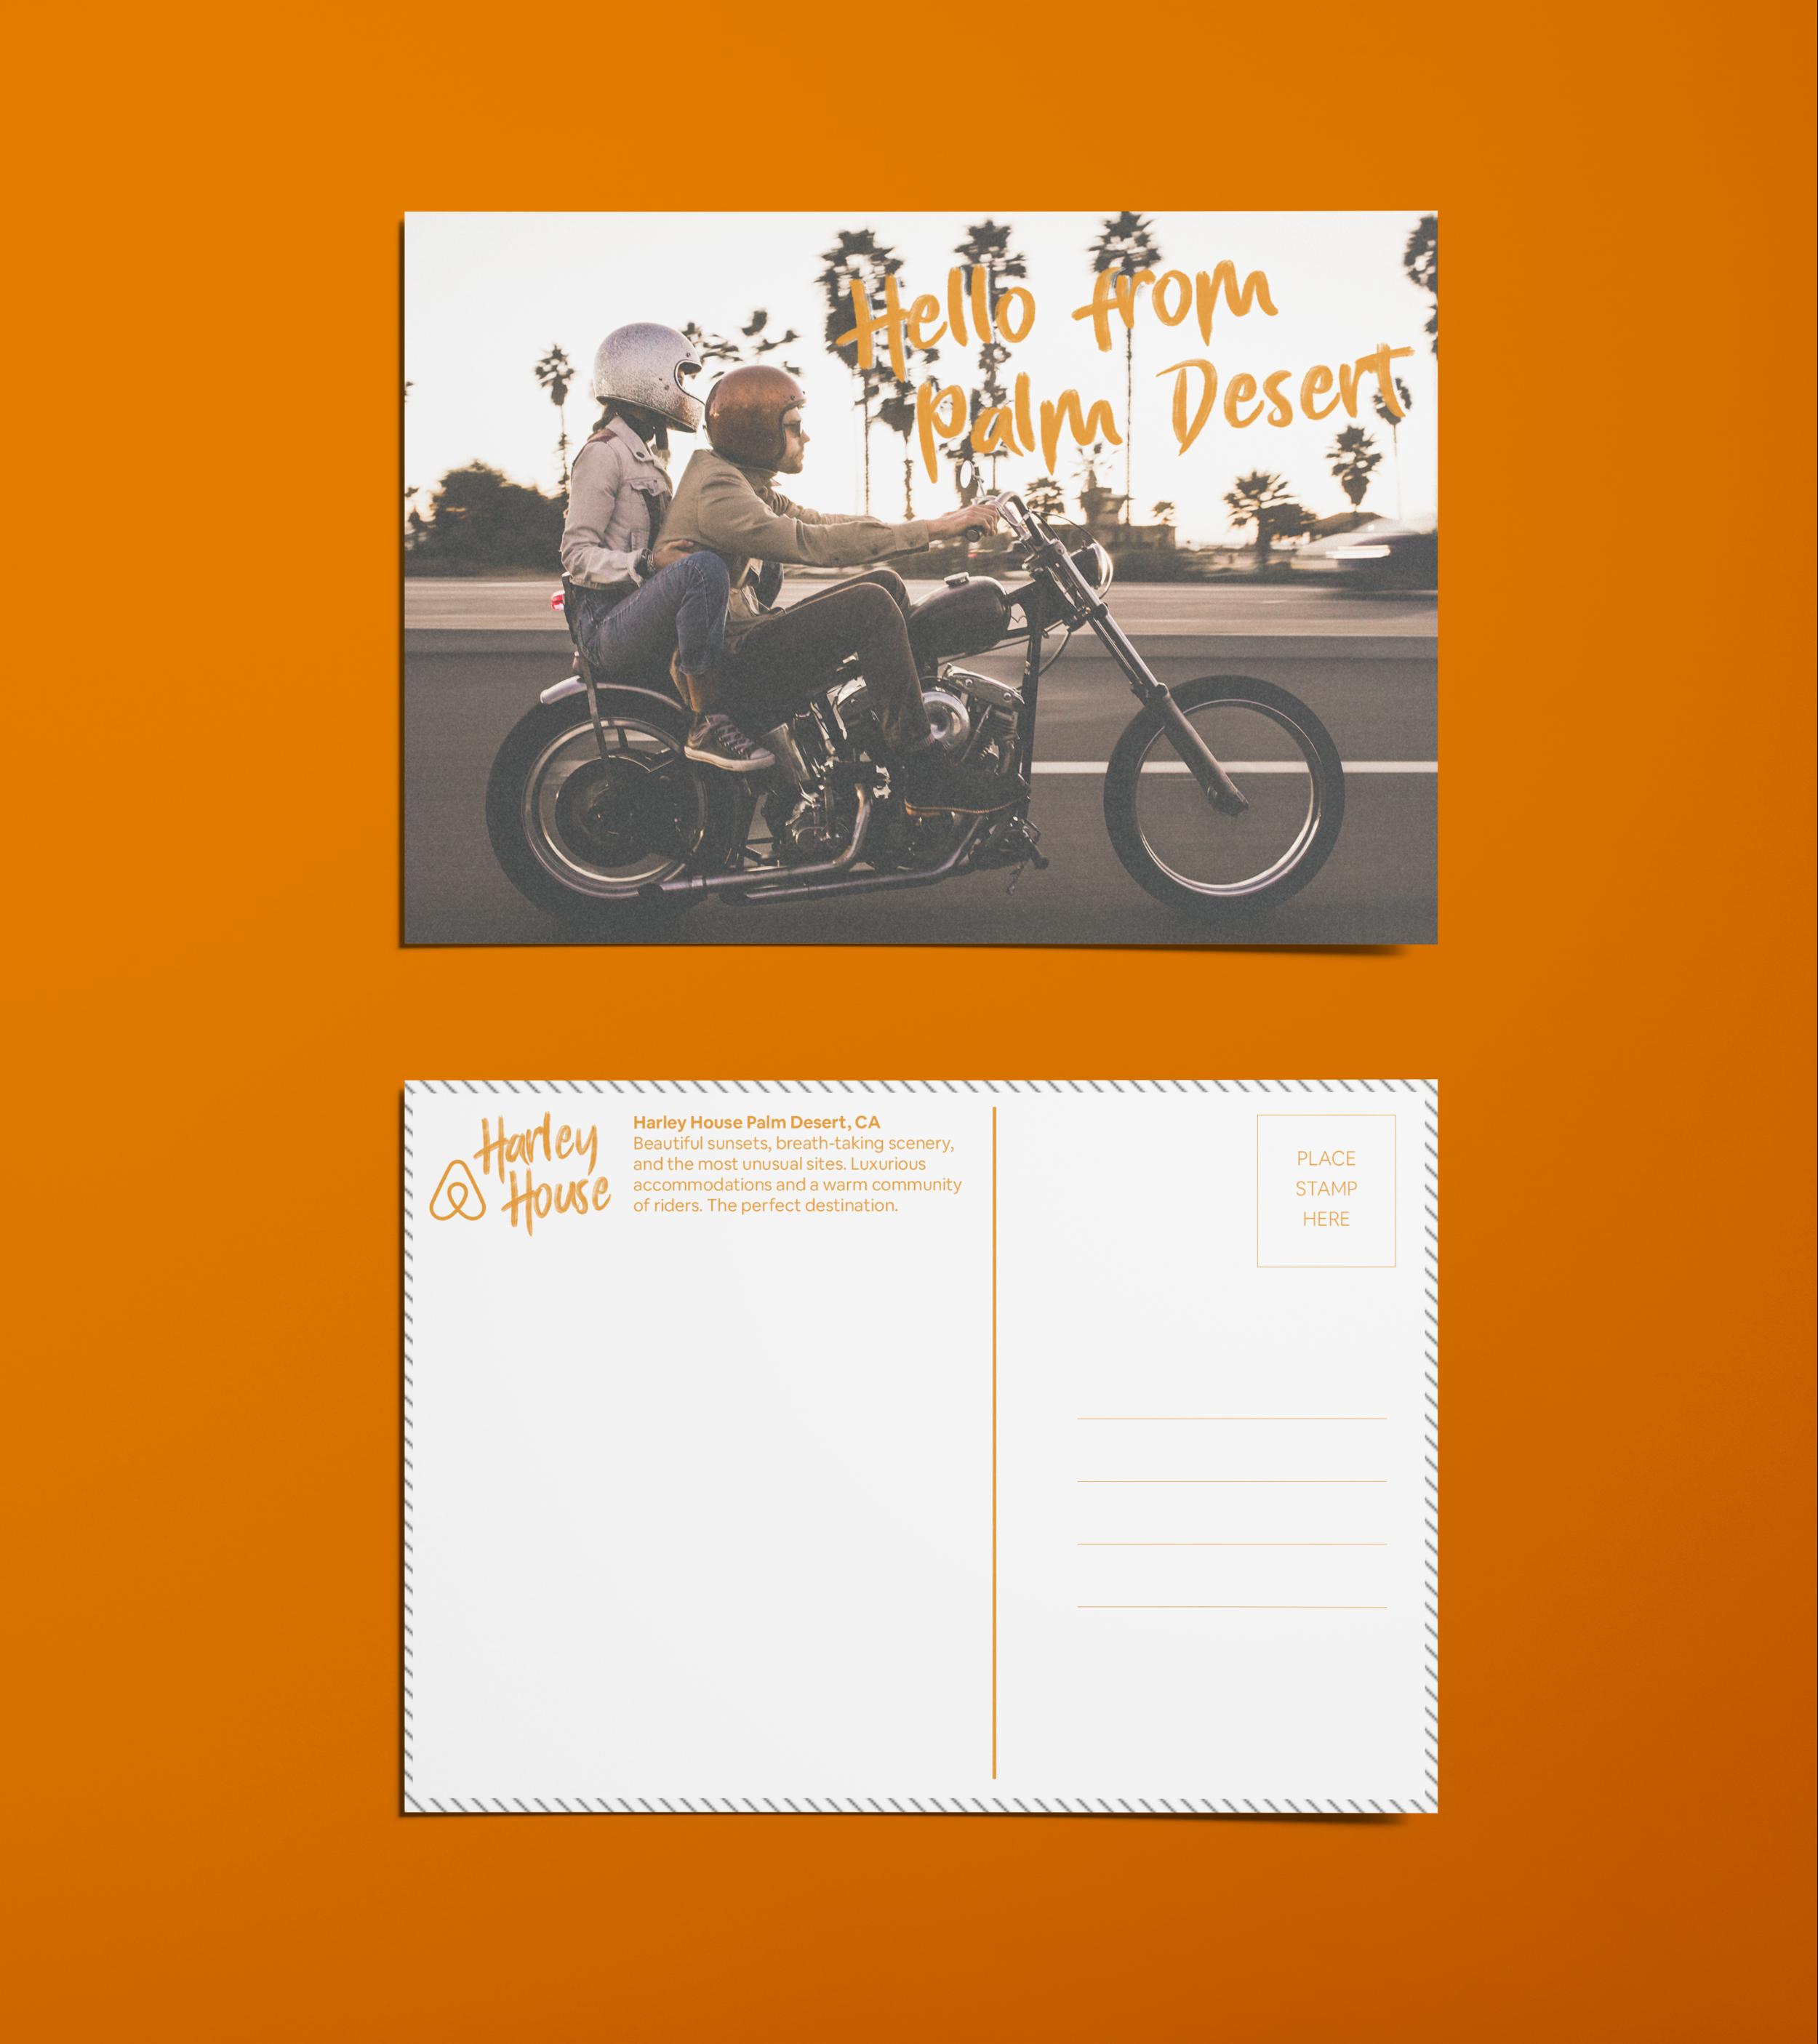 HarleyHouse_Postcard.png